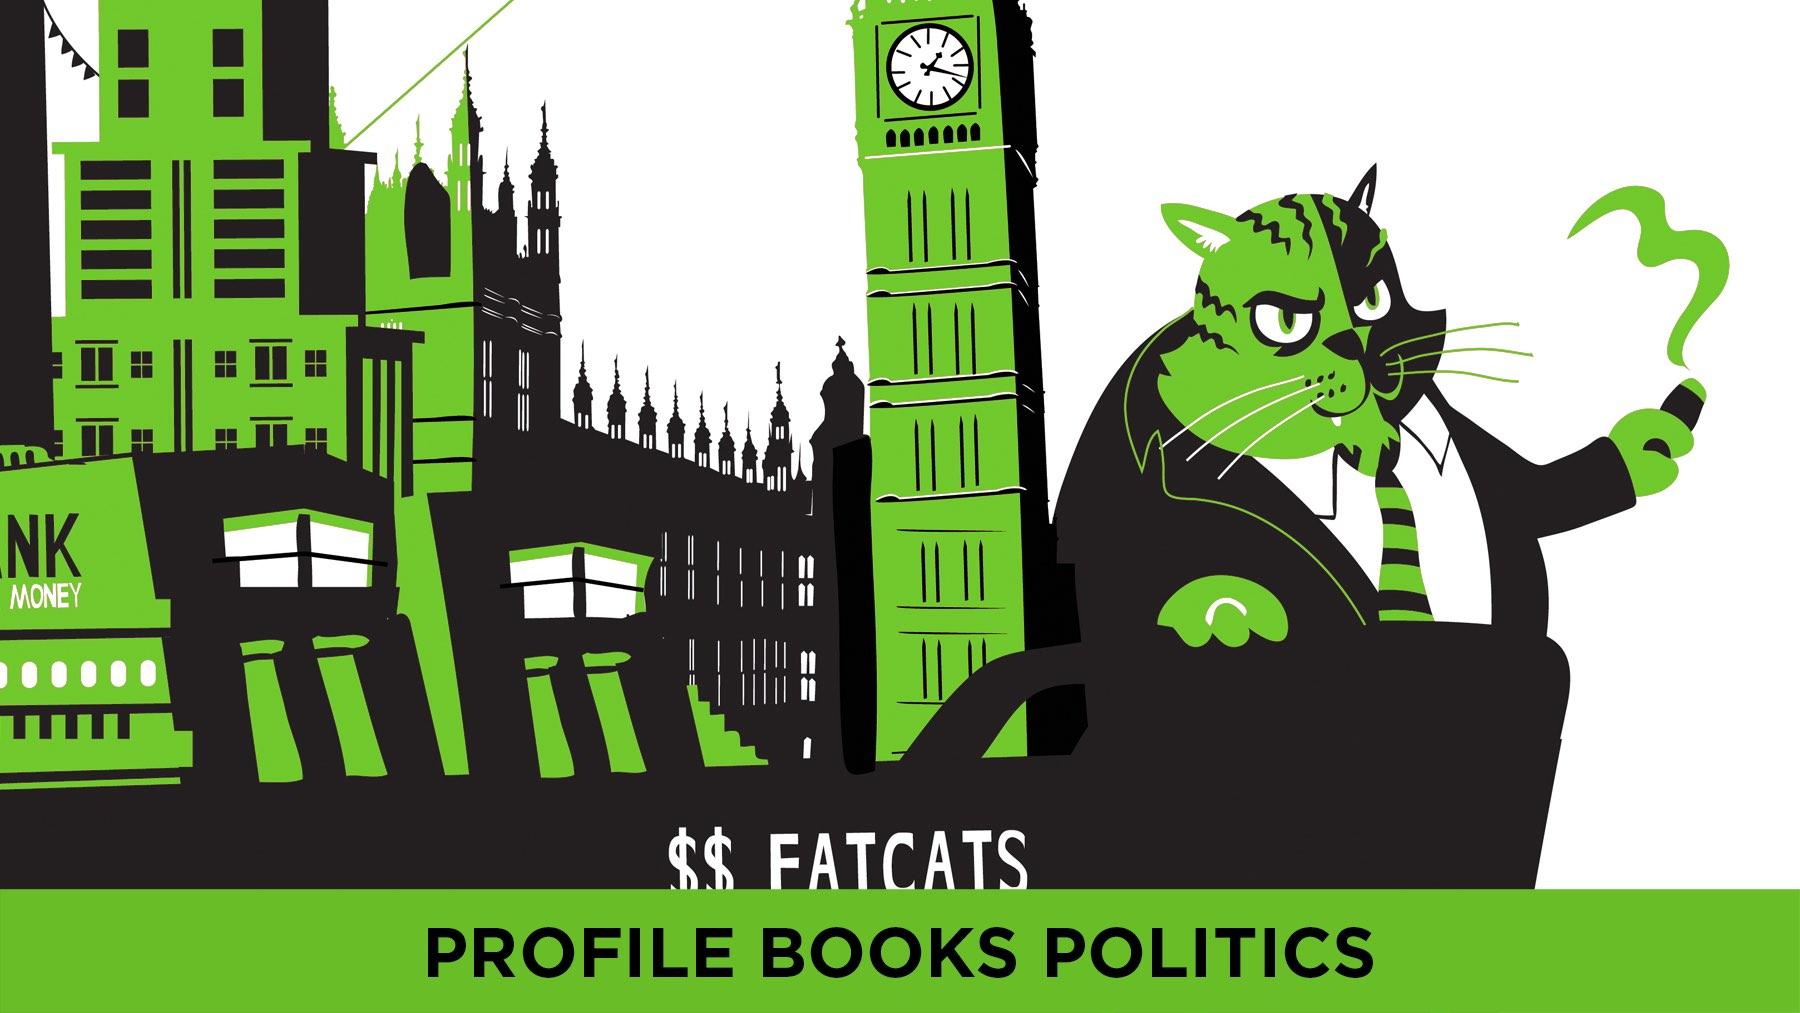 profile-books-politics-illustration-cognitive-01.jpg